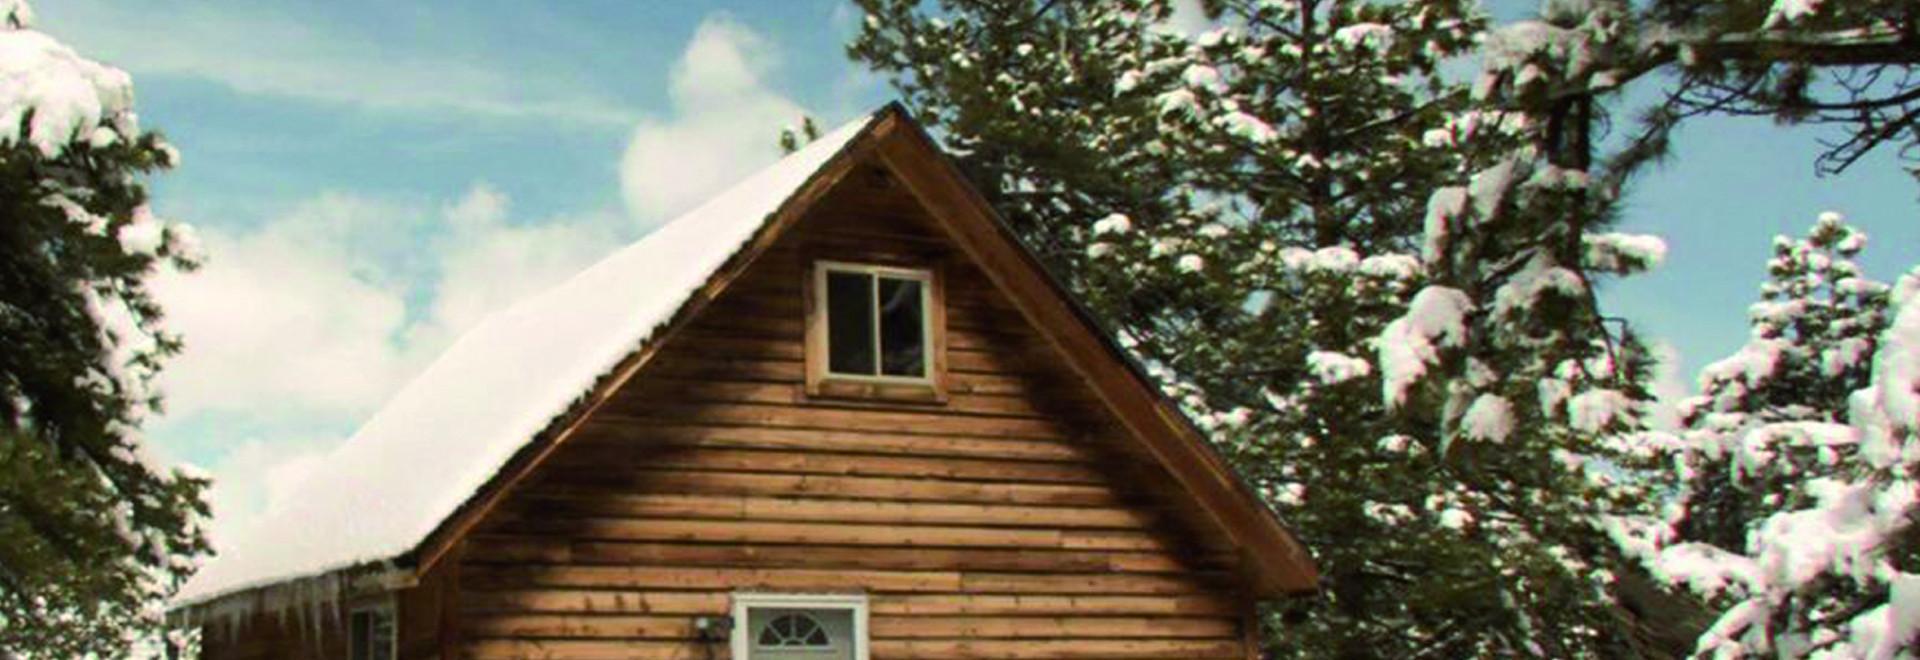 Una casa per lo Sasquatch